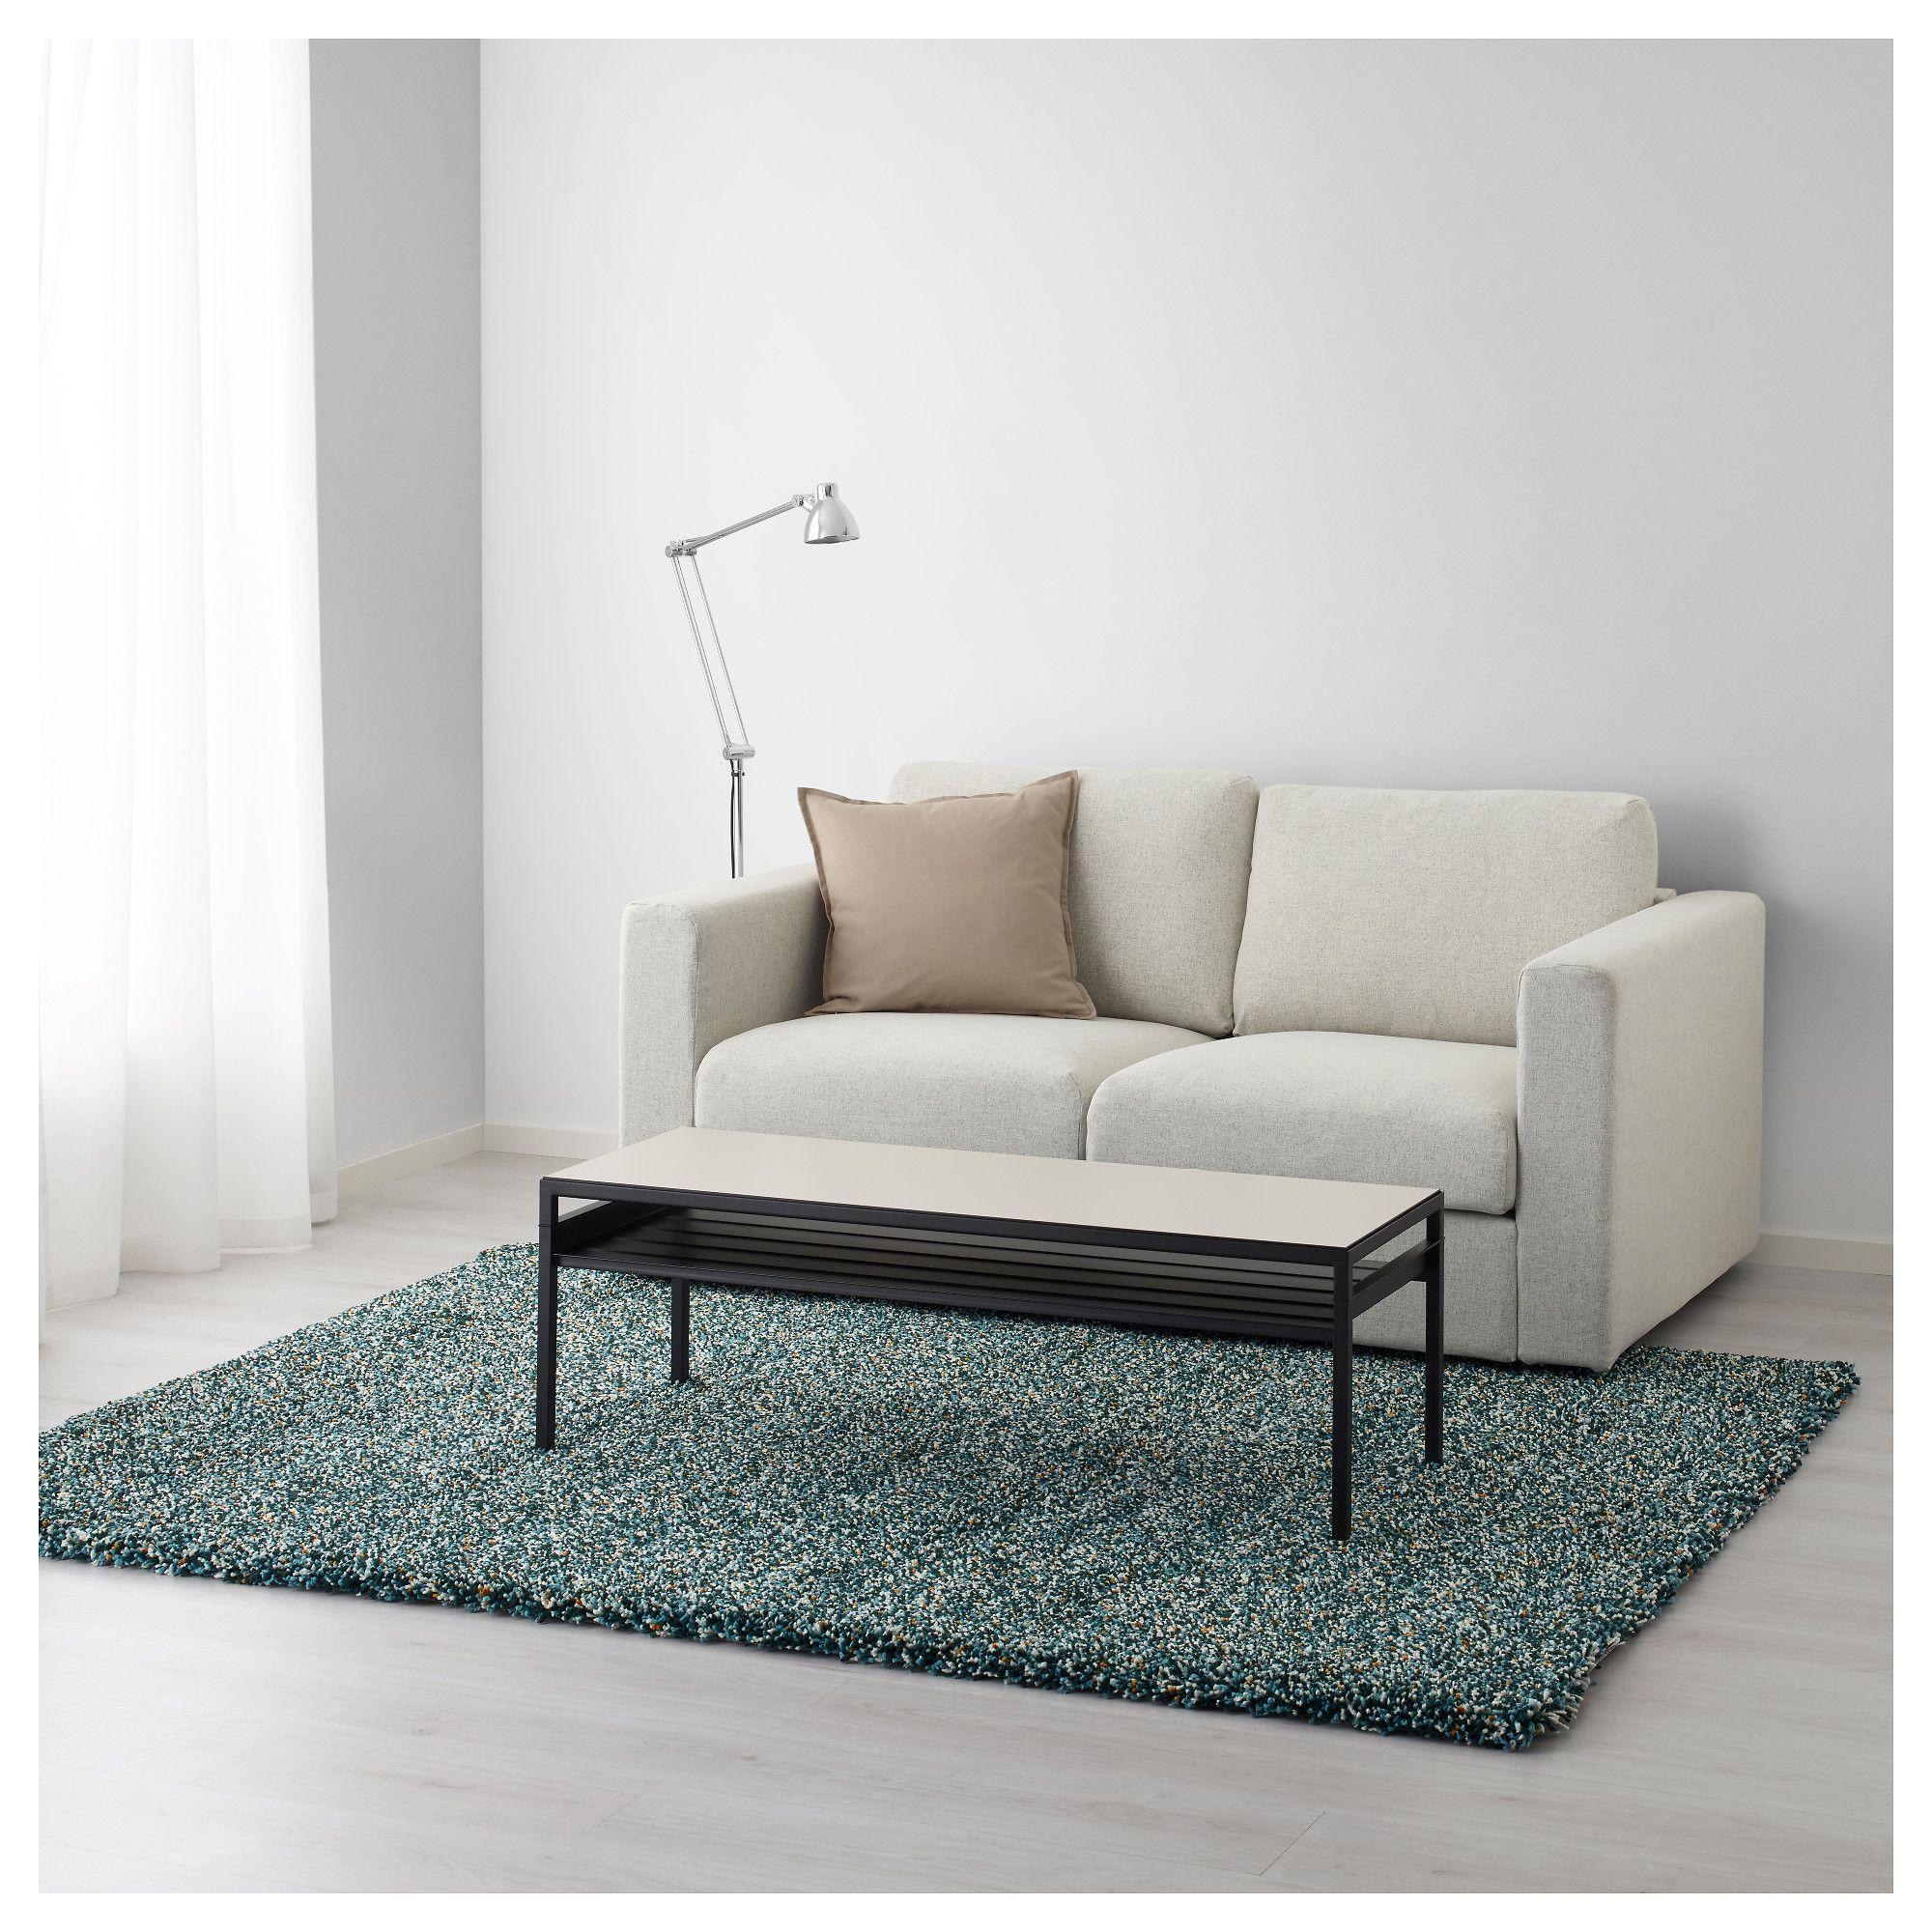 IKEA VINDUM Blue BlueGreen Rug, high pile Grey carpet